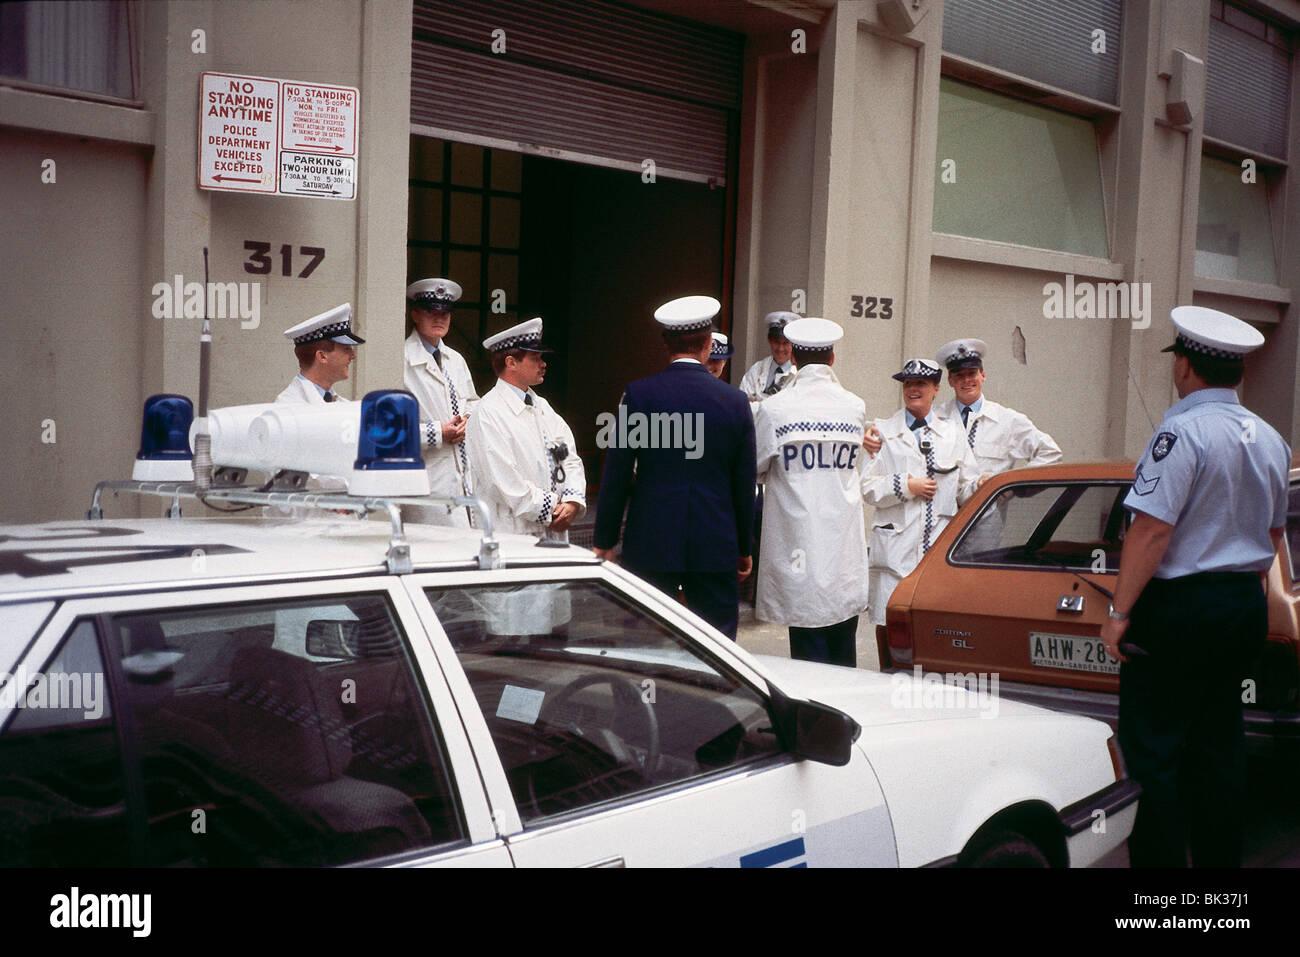 Police Officers Police Car In Melbourne Australia Stock Photo Alamy